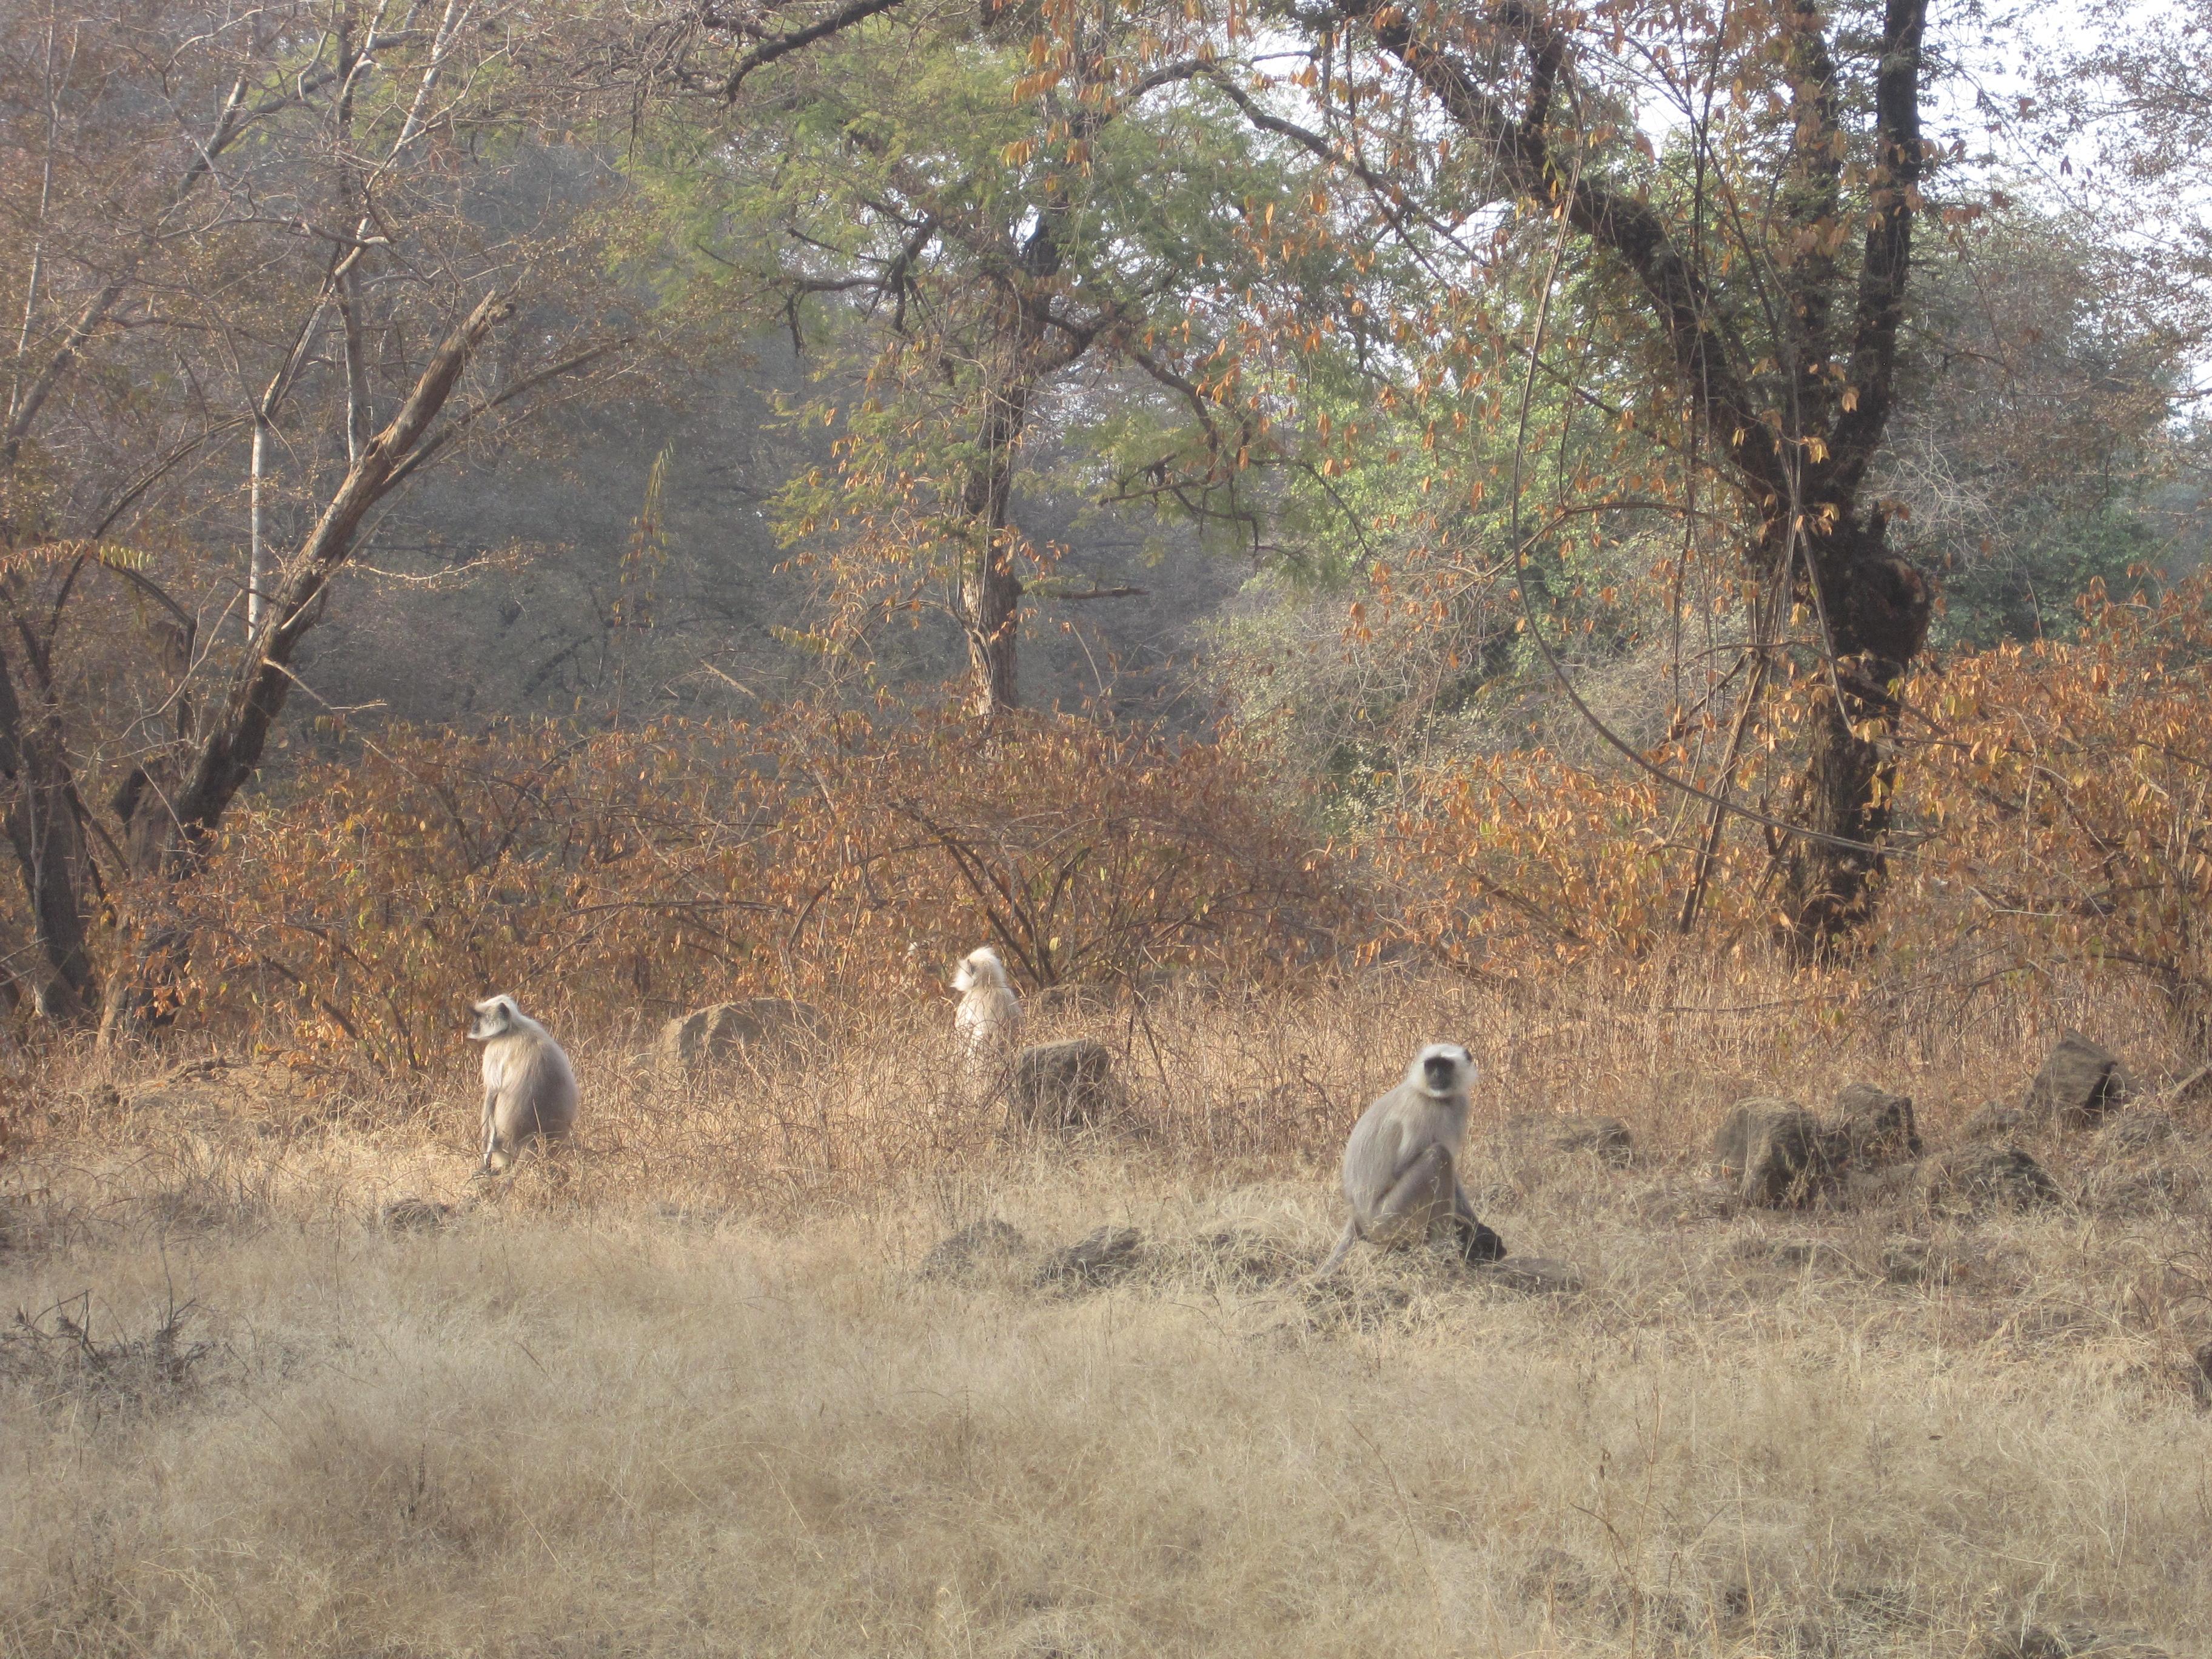 Monkeys in Ranthambhore National Park - photo by Juliamaud